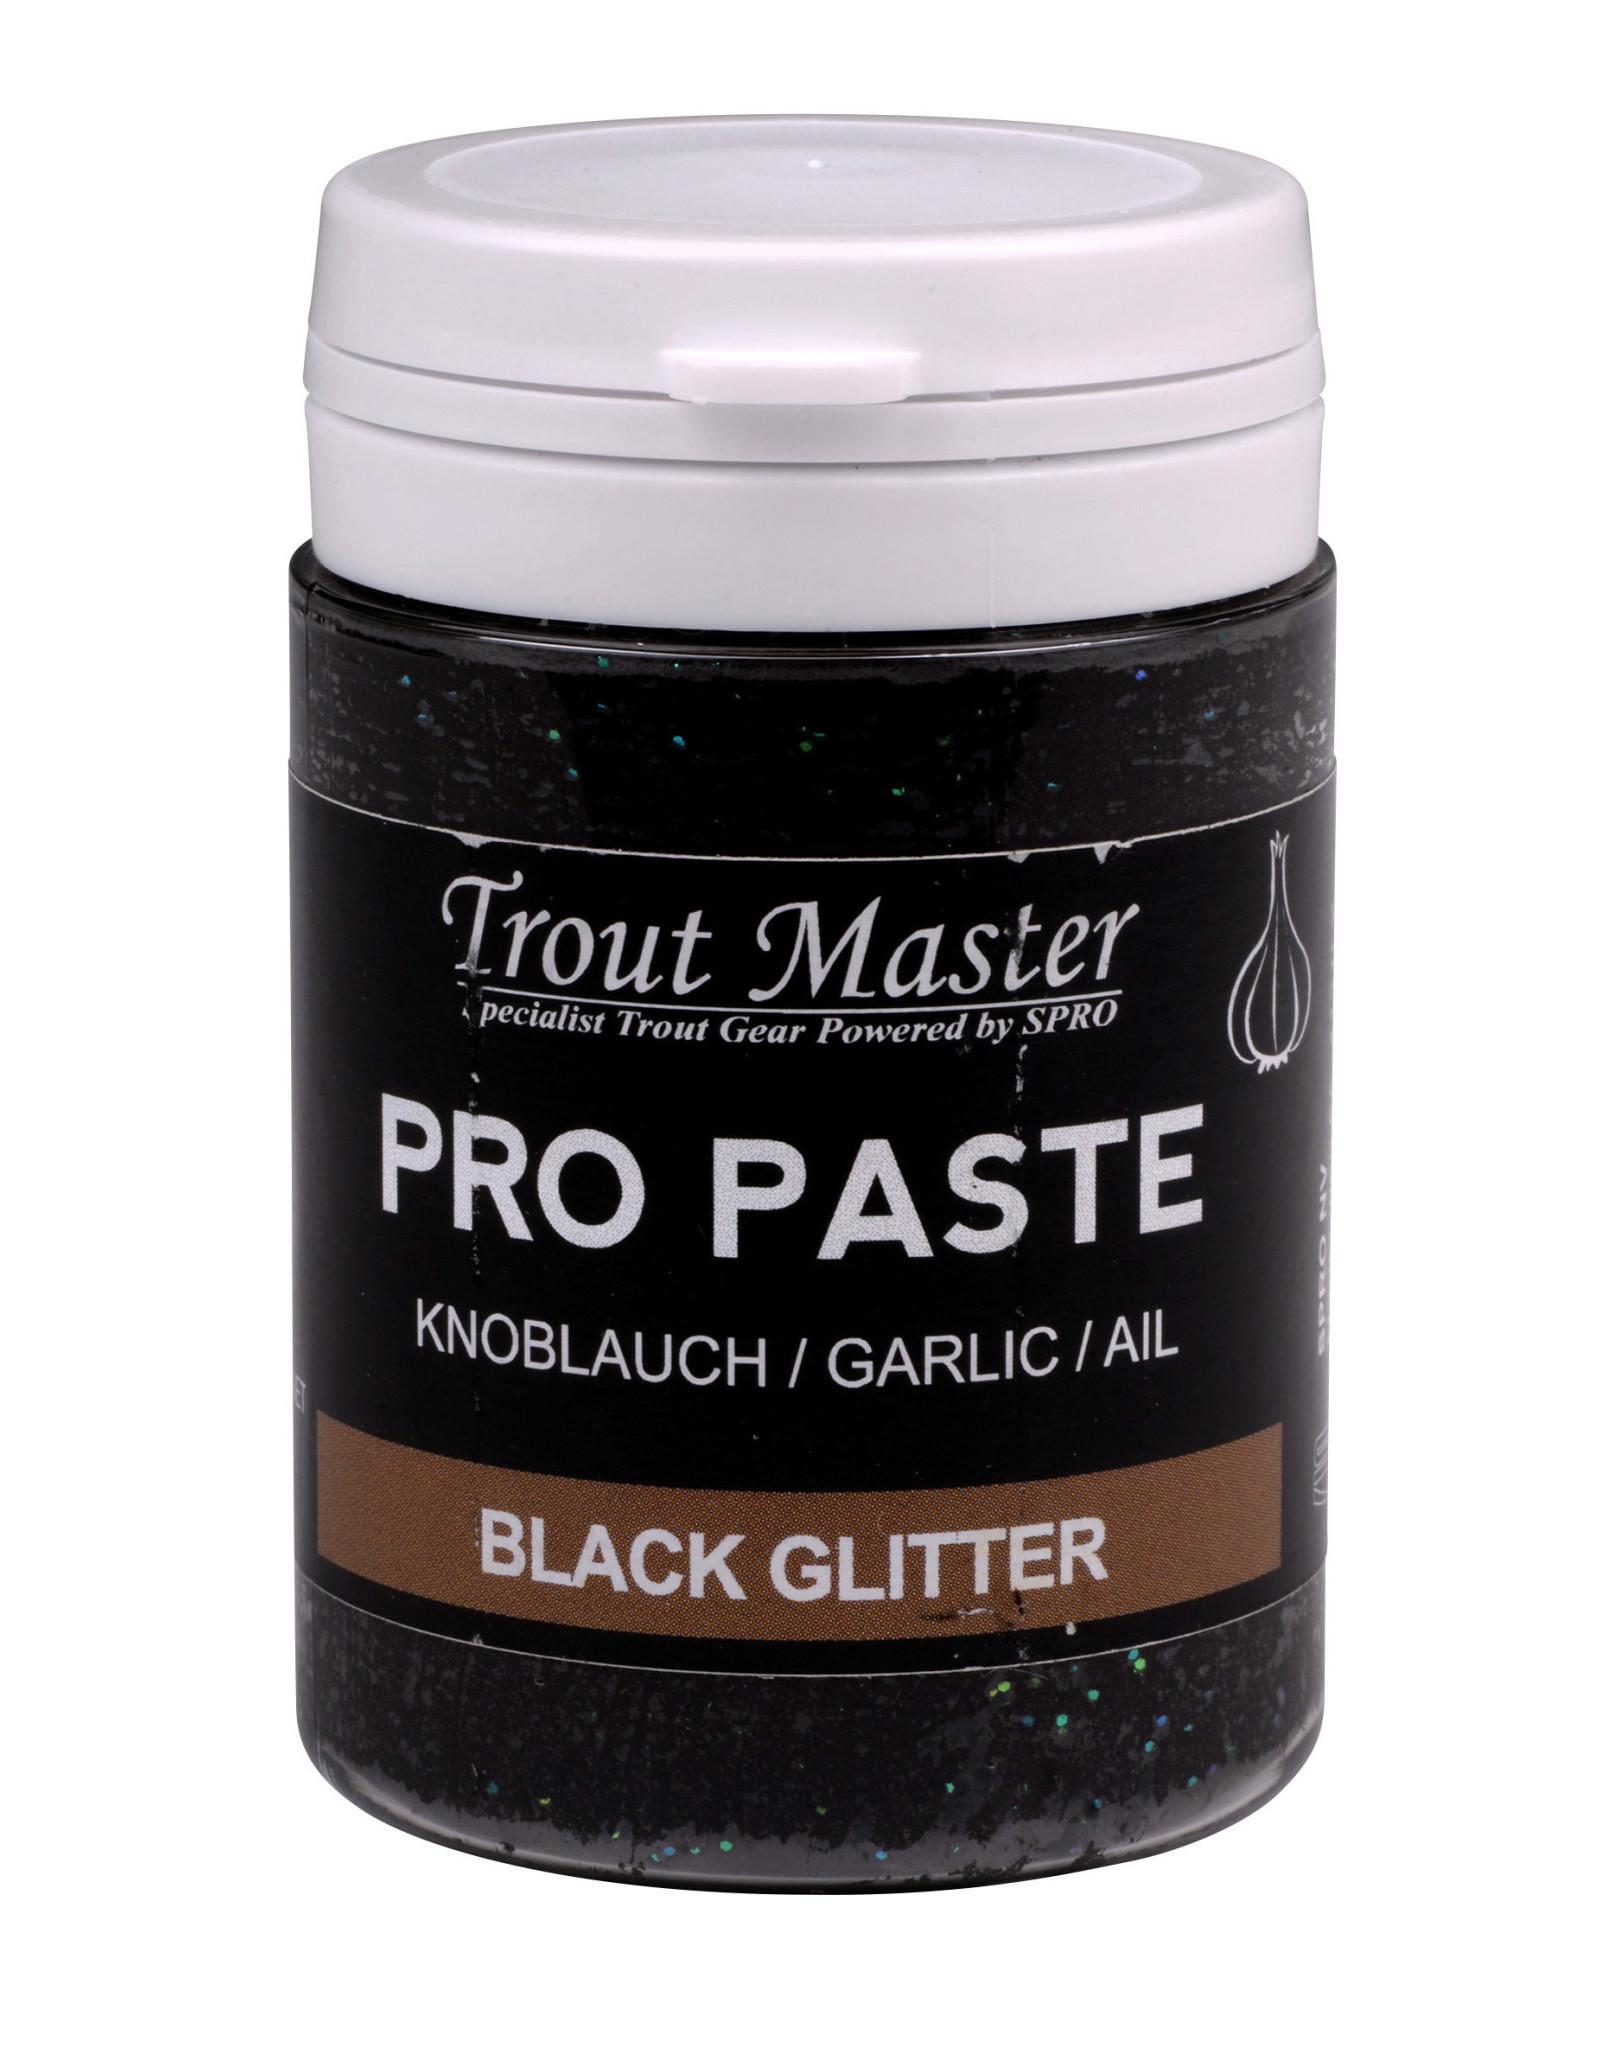 TROUT MASTER PRO PASTE BLACK GLITTER